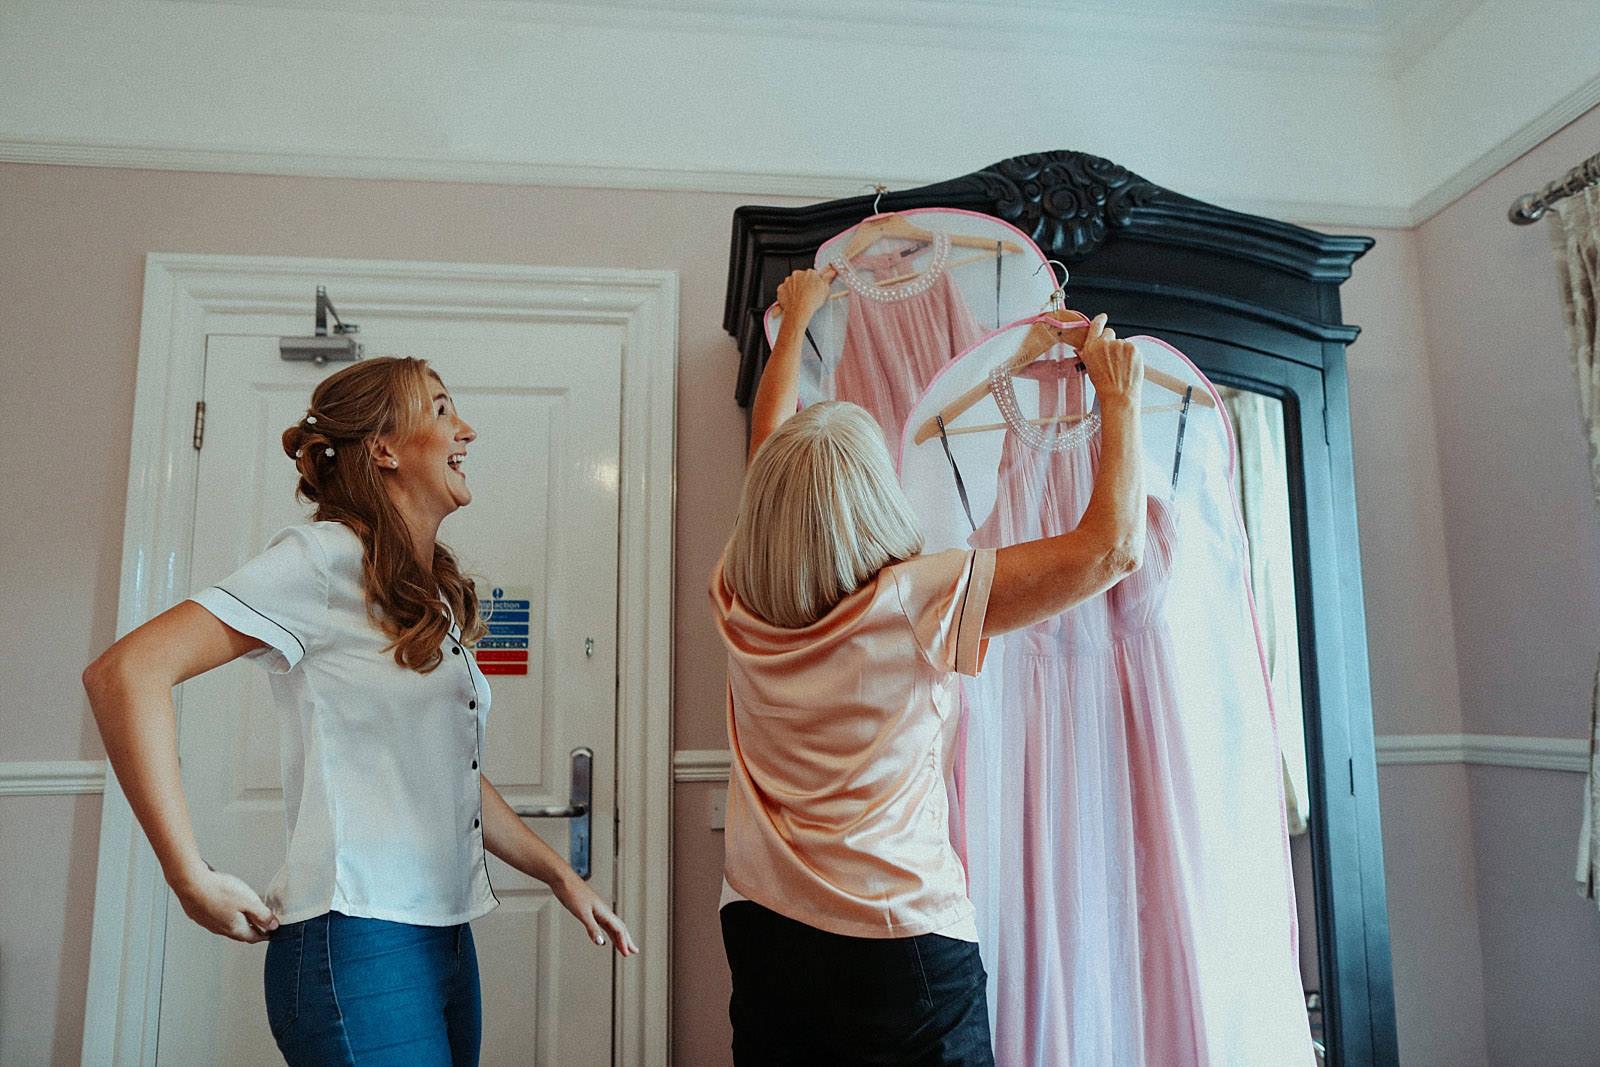 brides mum hooking dress on wardrobe